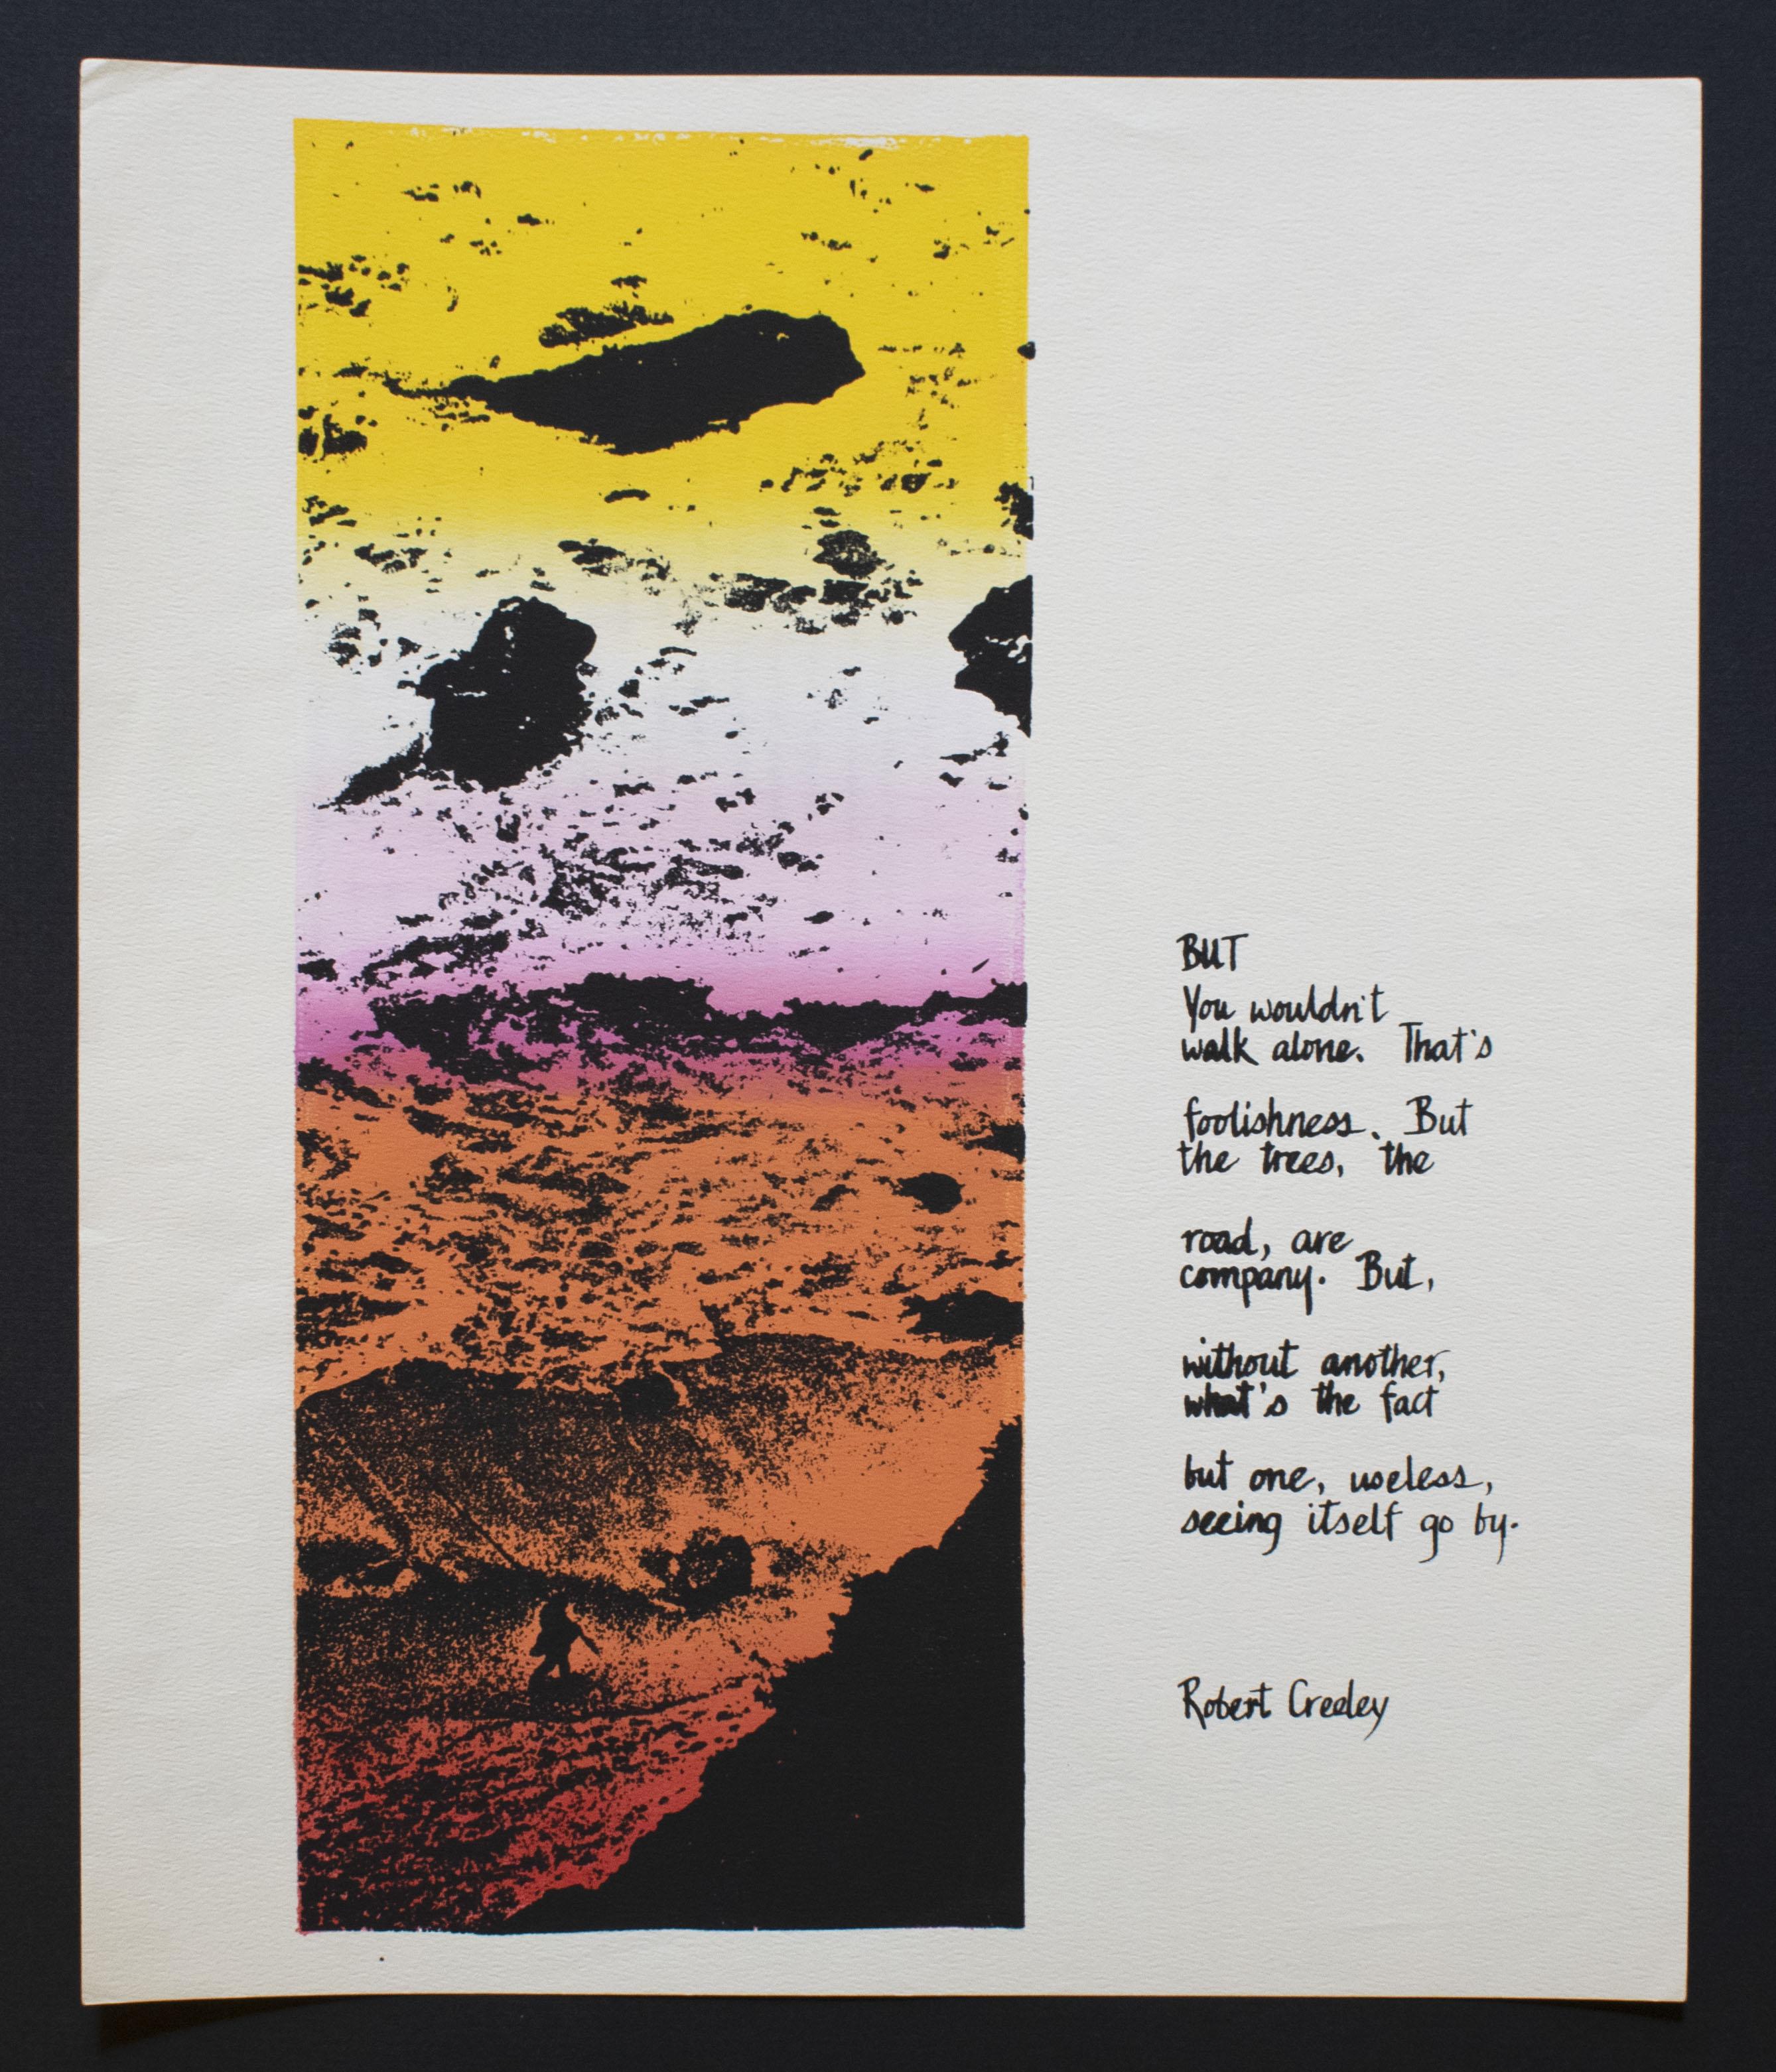 Robert Creeley (American, 1926 – 2005). But, 1975.